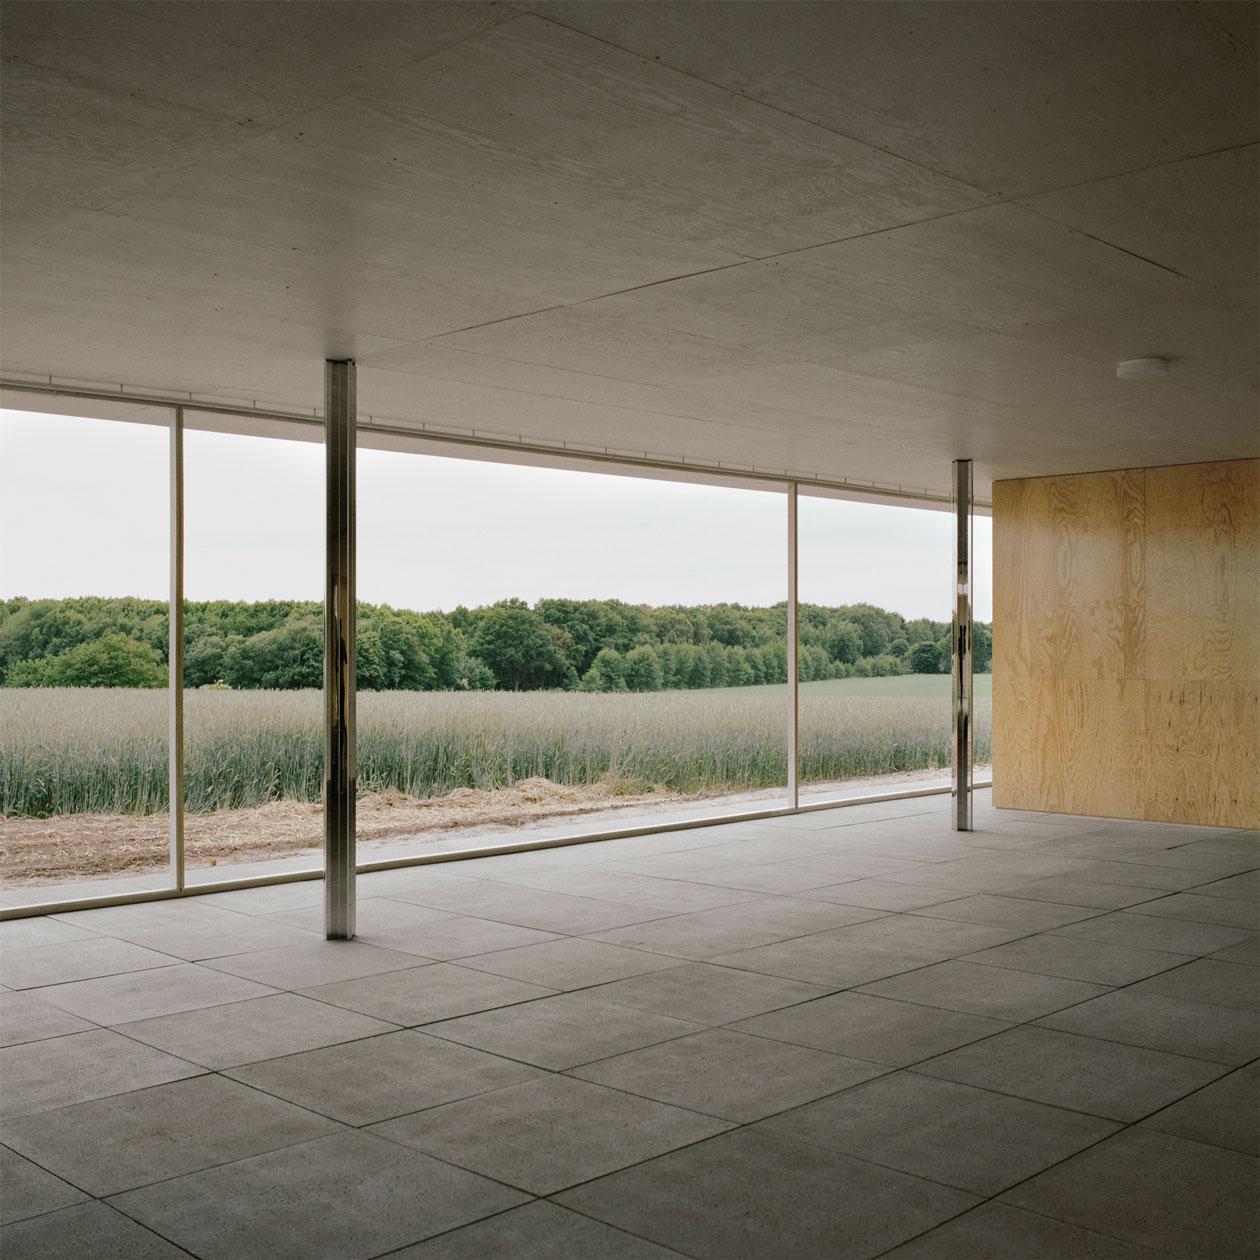 Architektur-Szene